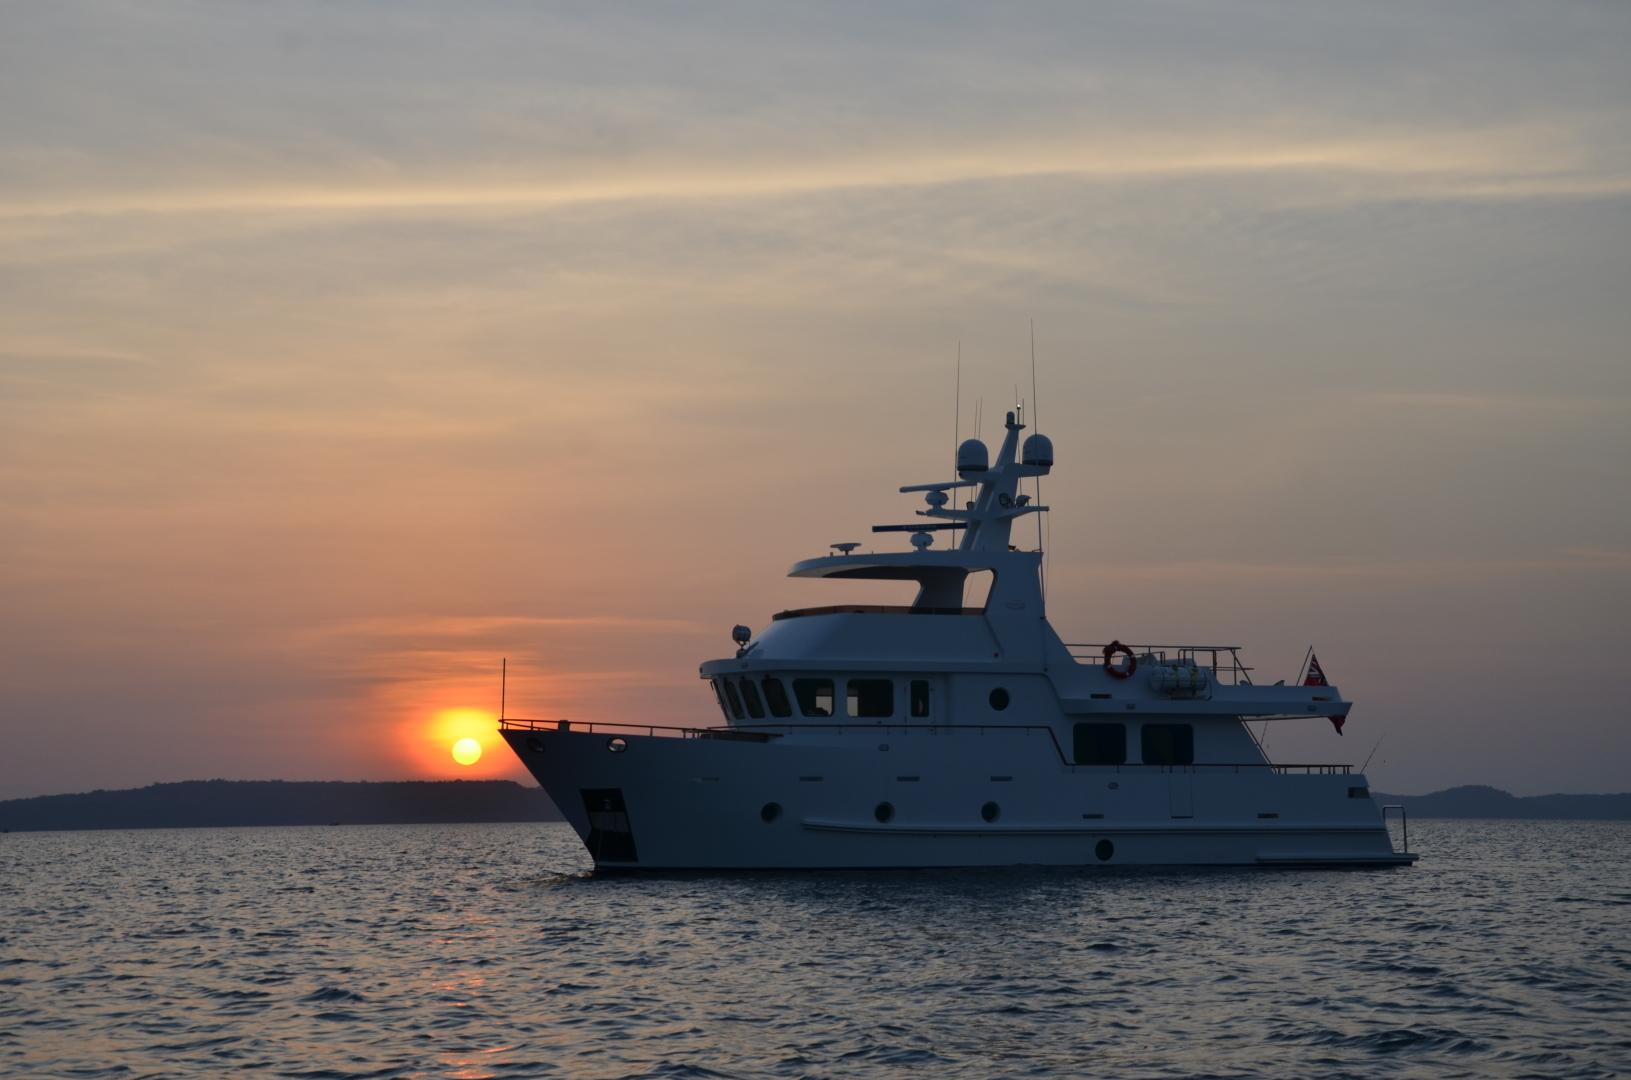 Bering-65 Bering Yacht 2013-Namaste Dania-Florida-United States-1400981   Thumbnail